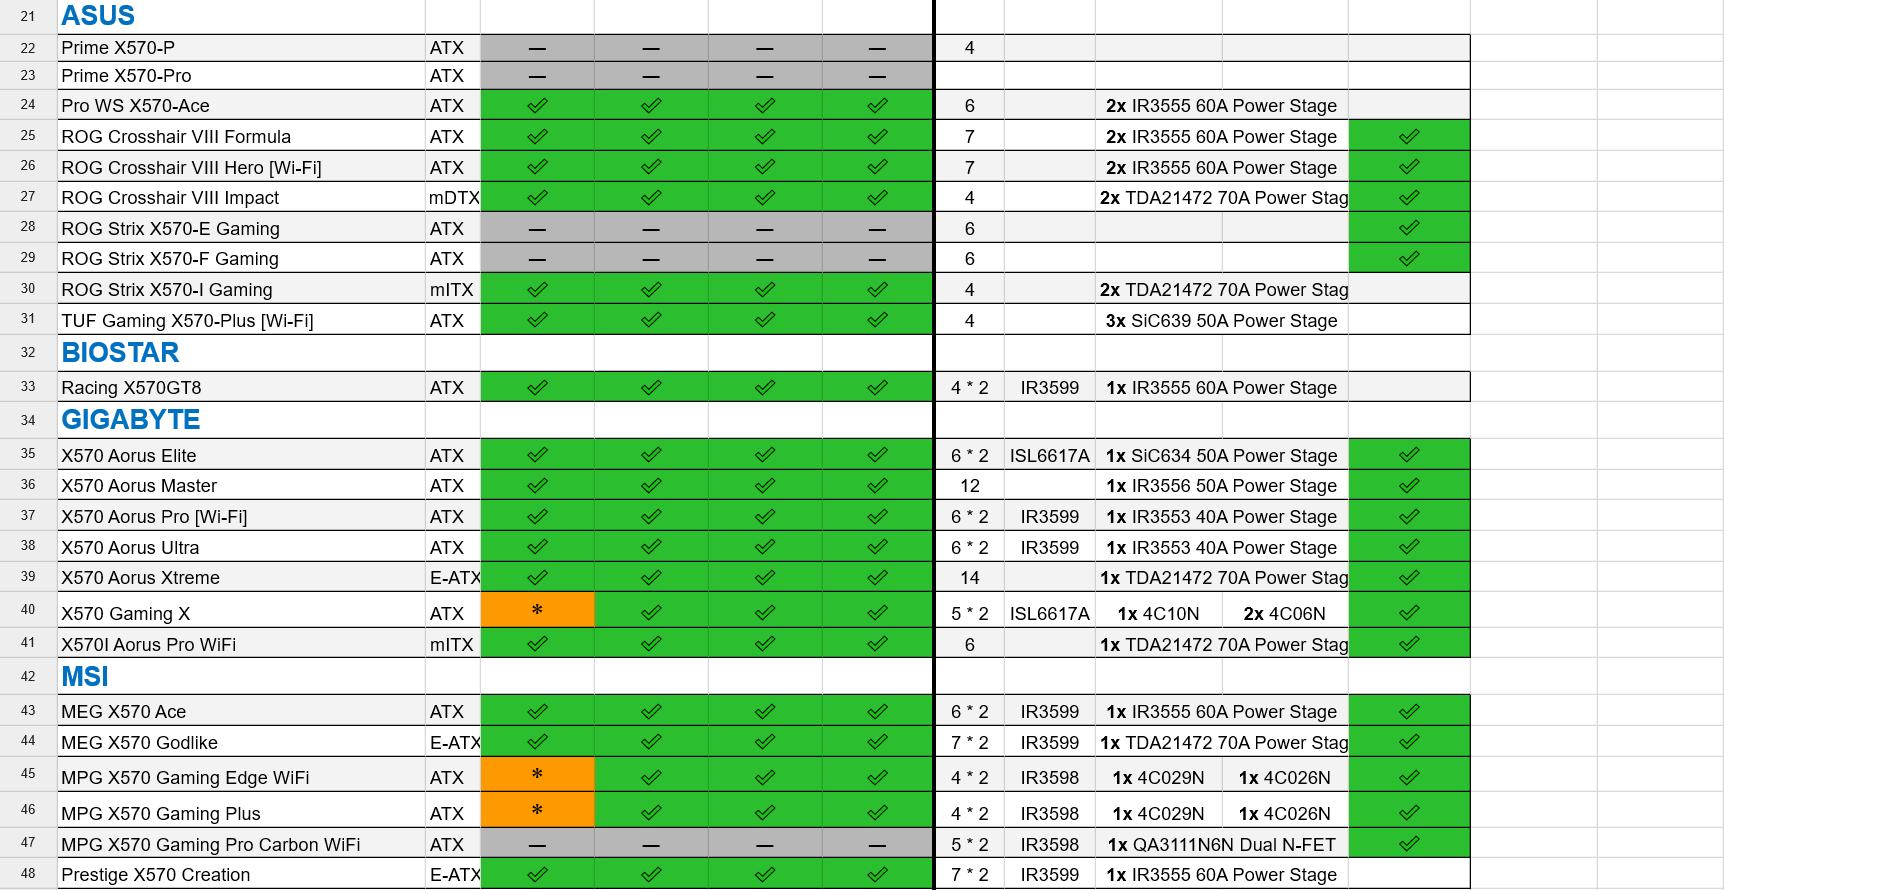 Best mATX AM4 board - Motherboards - Level1Techs Forums